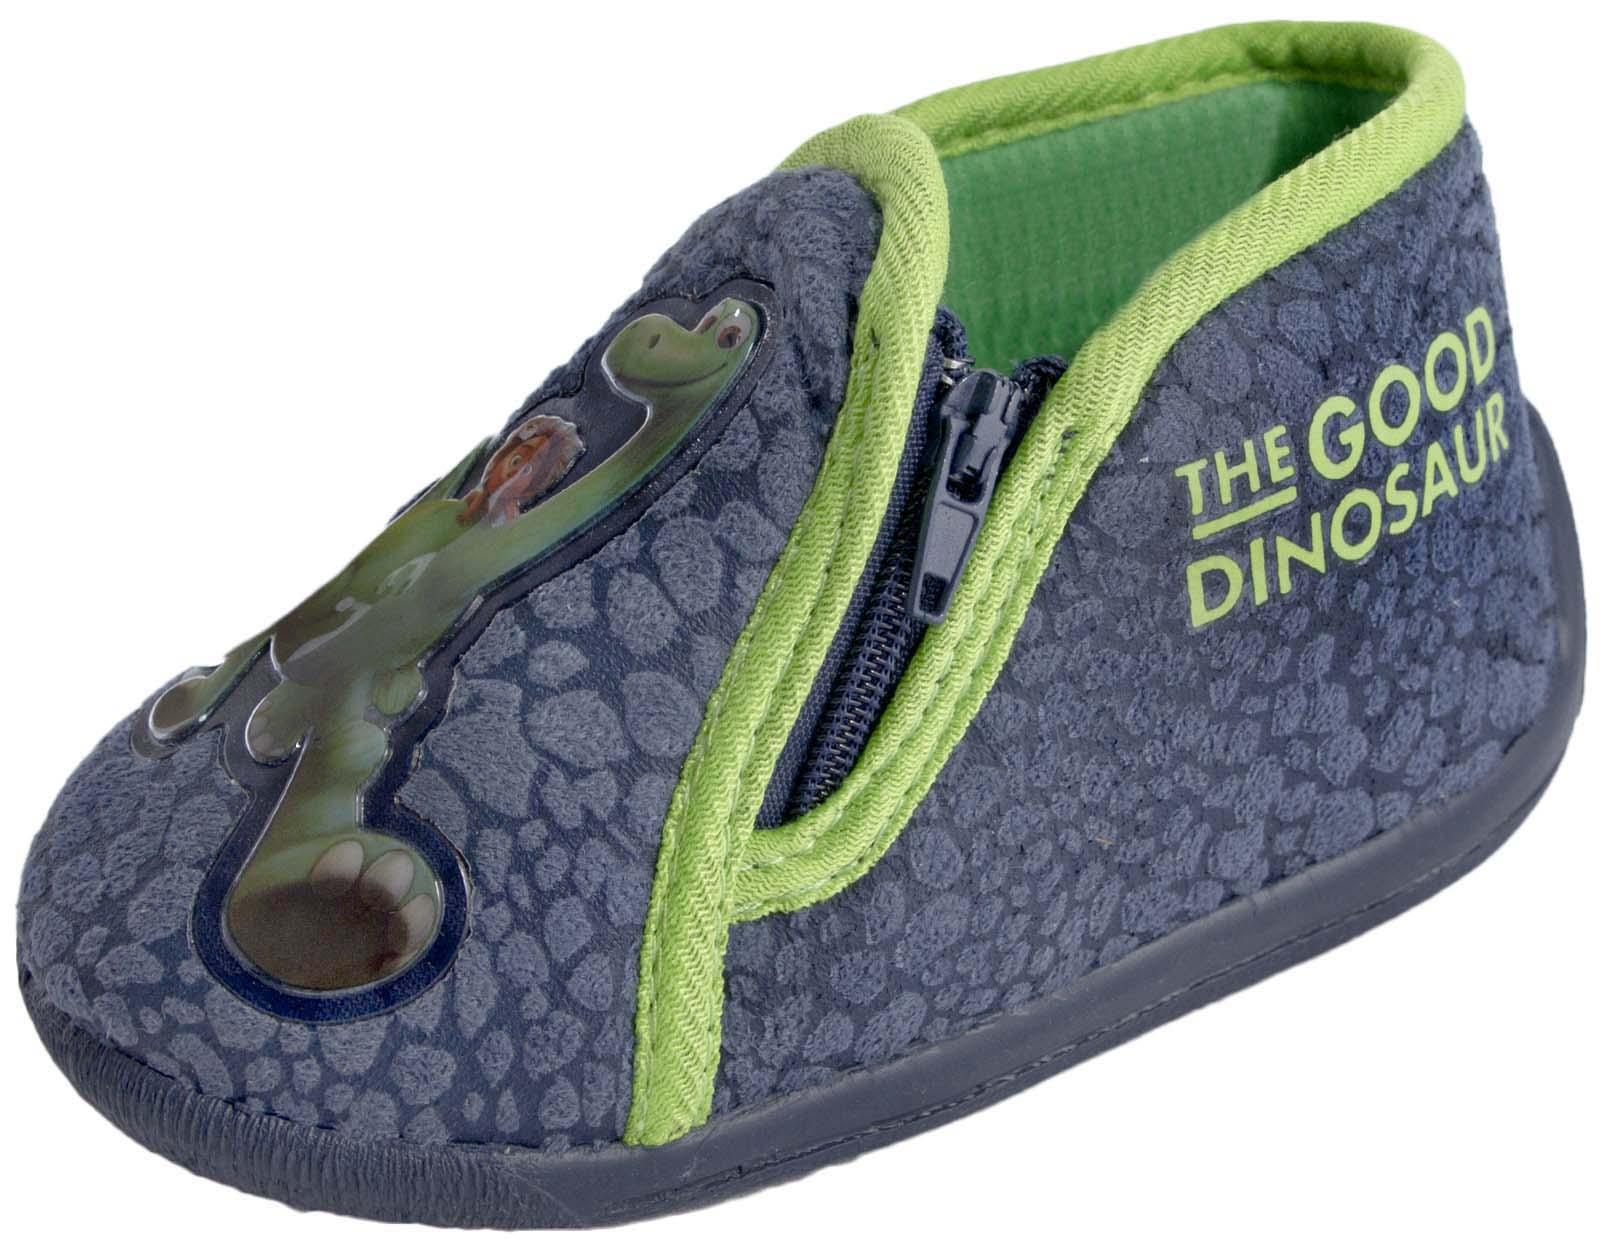 2830afce4d20 Kids Boys Disney The Good Dinosaur Slippers Childrens Shoes Infants ...